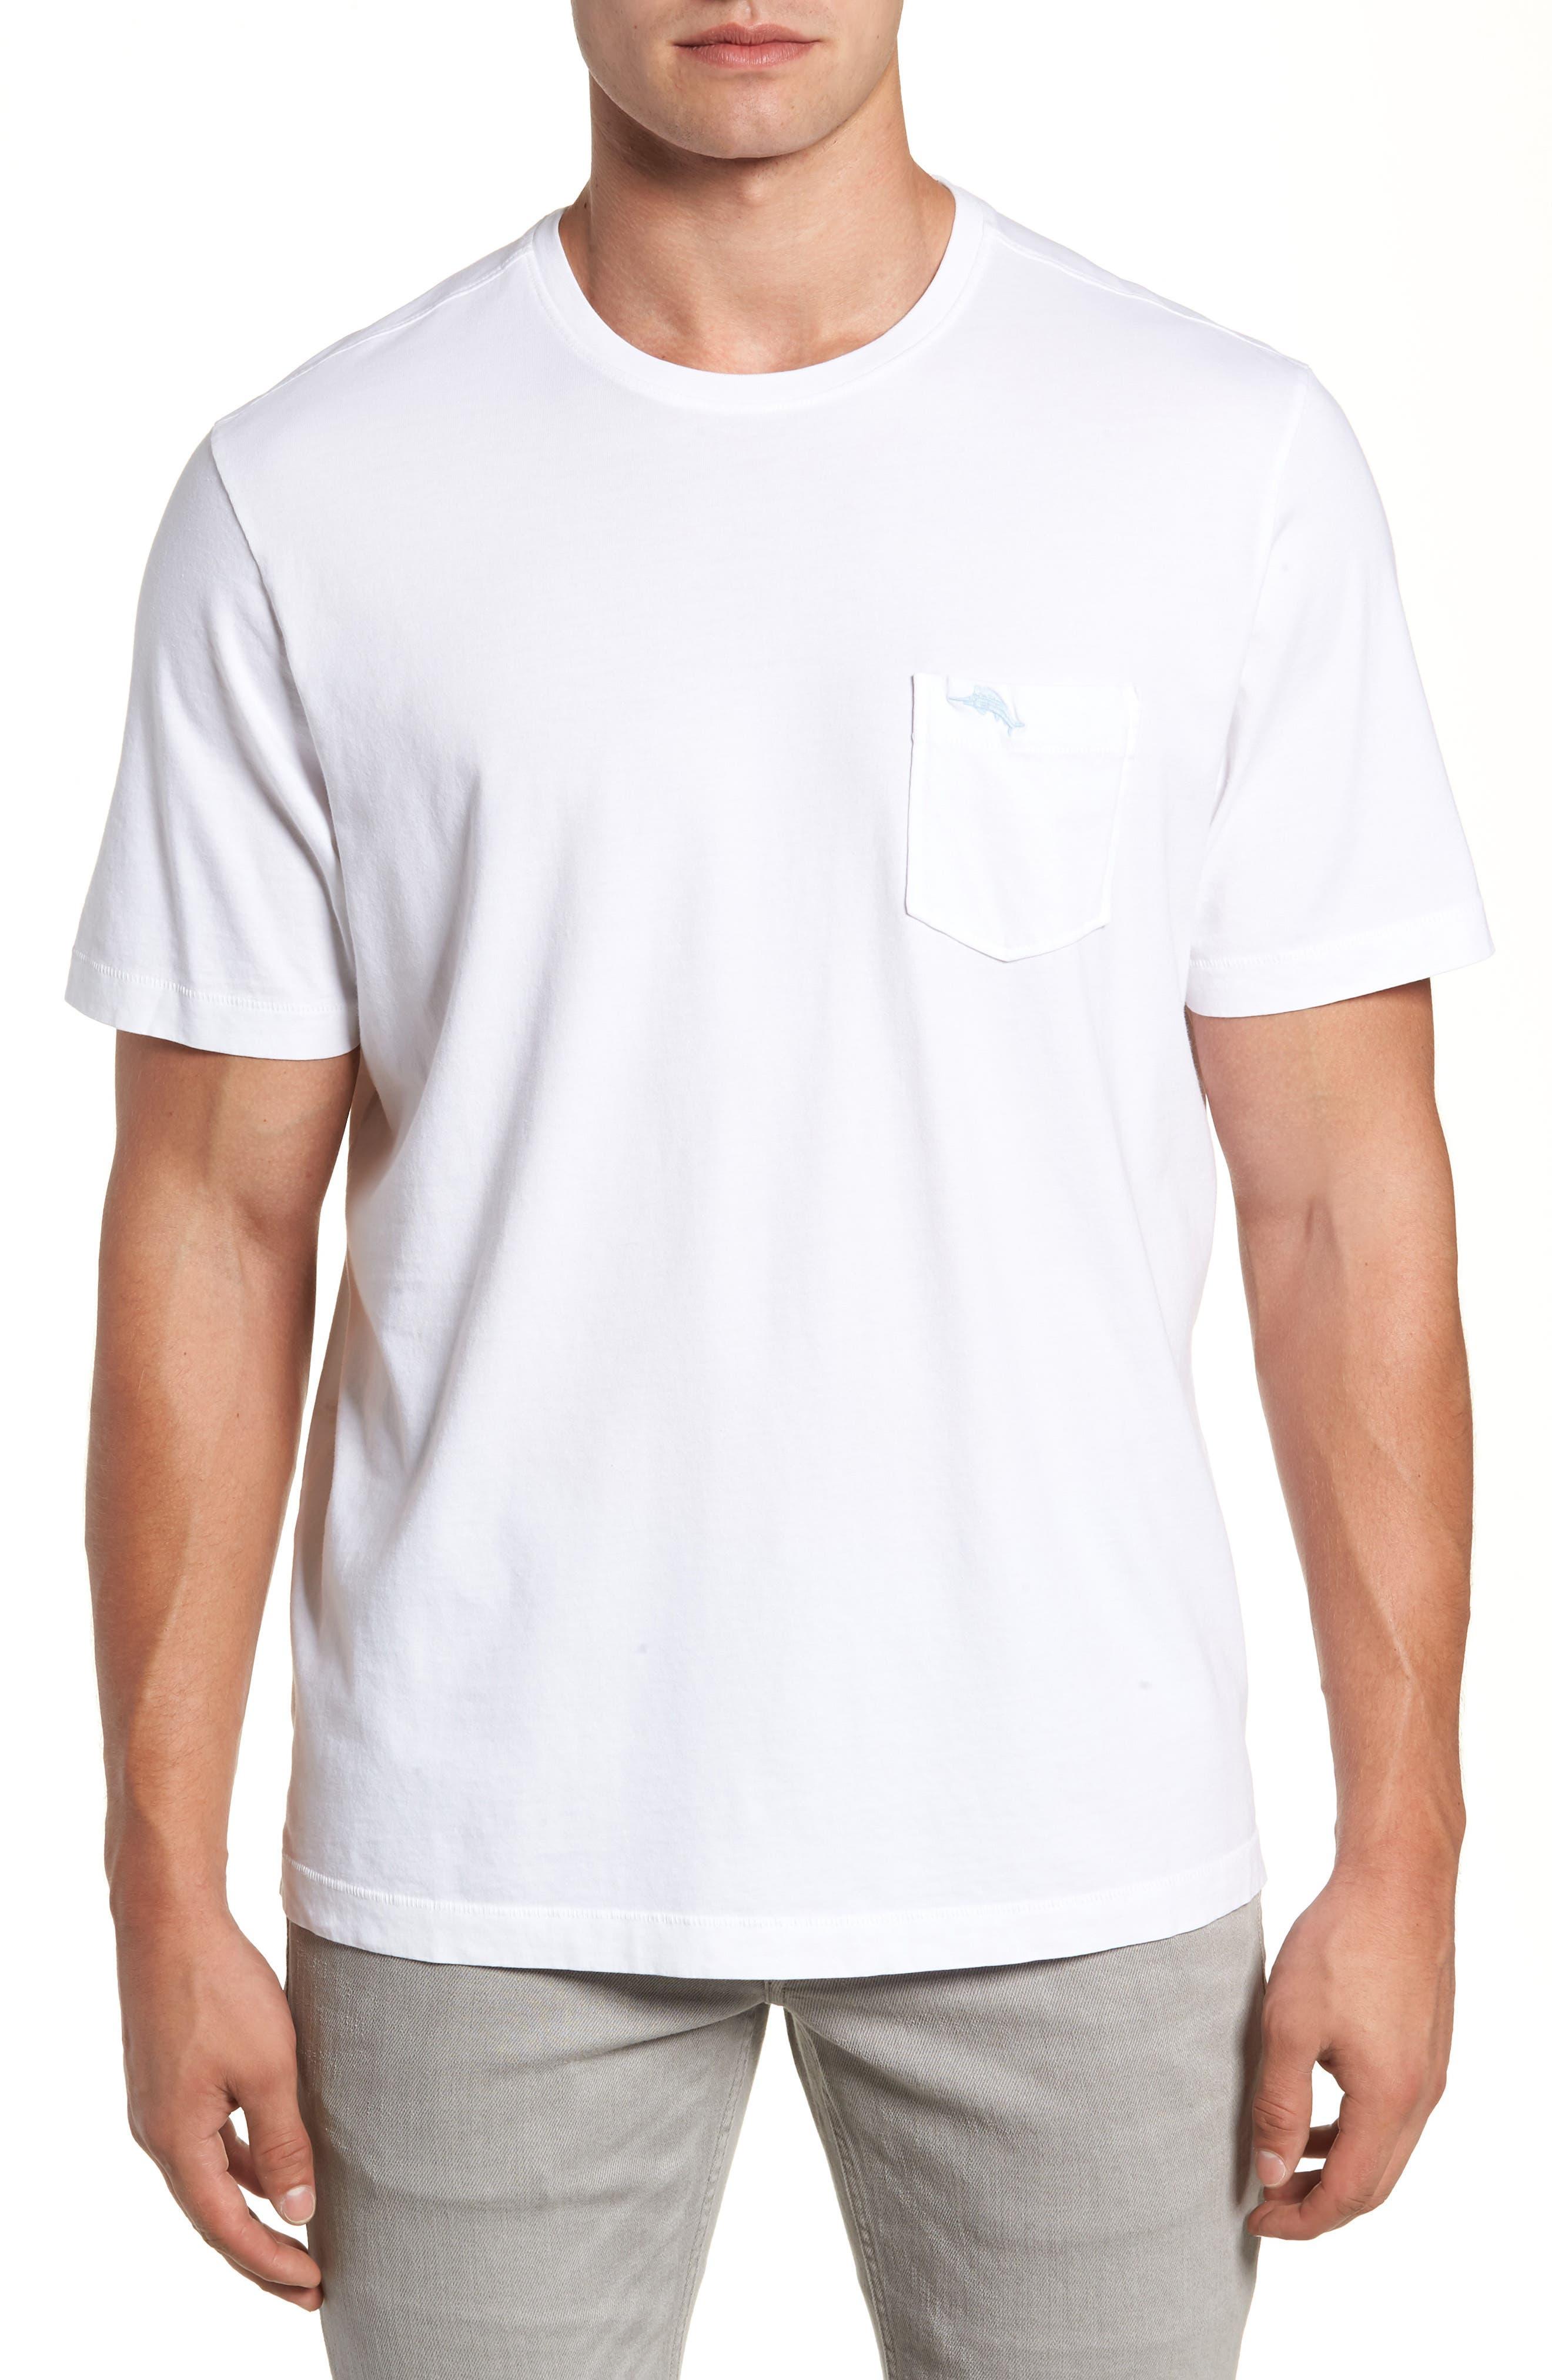 Tommy Bahama Men/'s Tee Shirt Size S,M,L XL,Island Sleepwear Logo Navy*